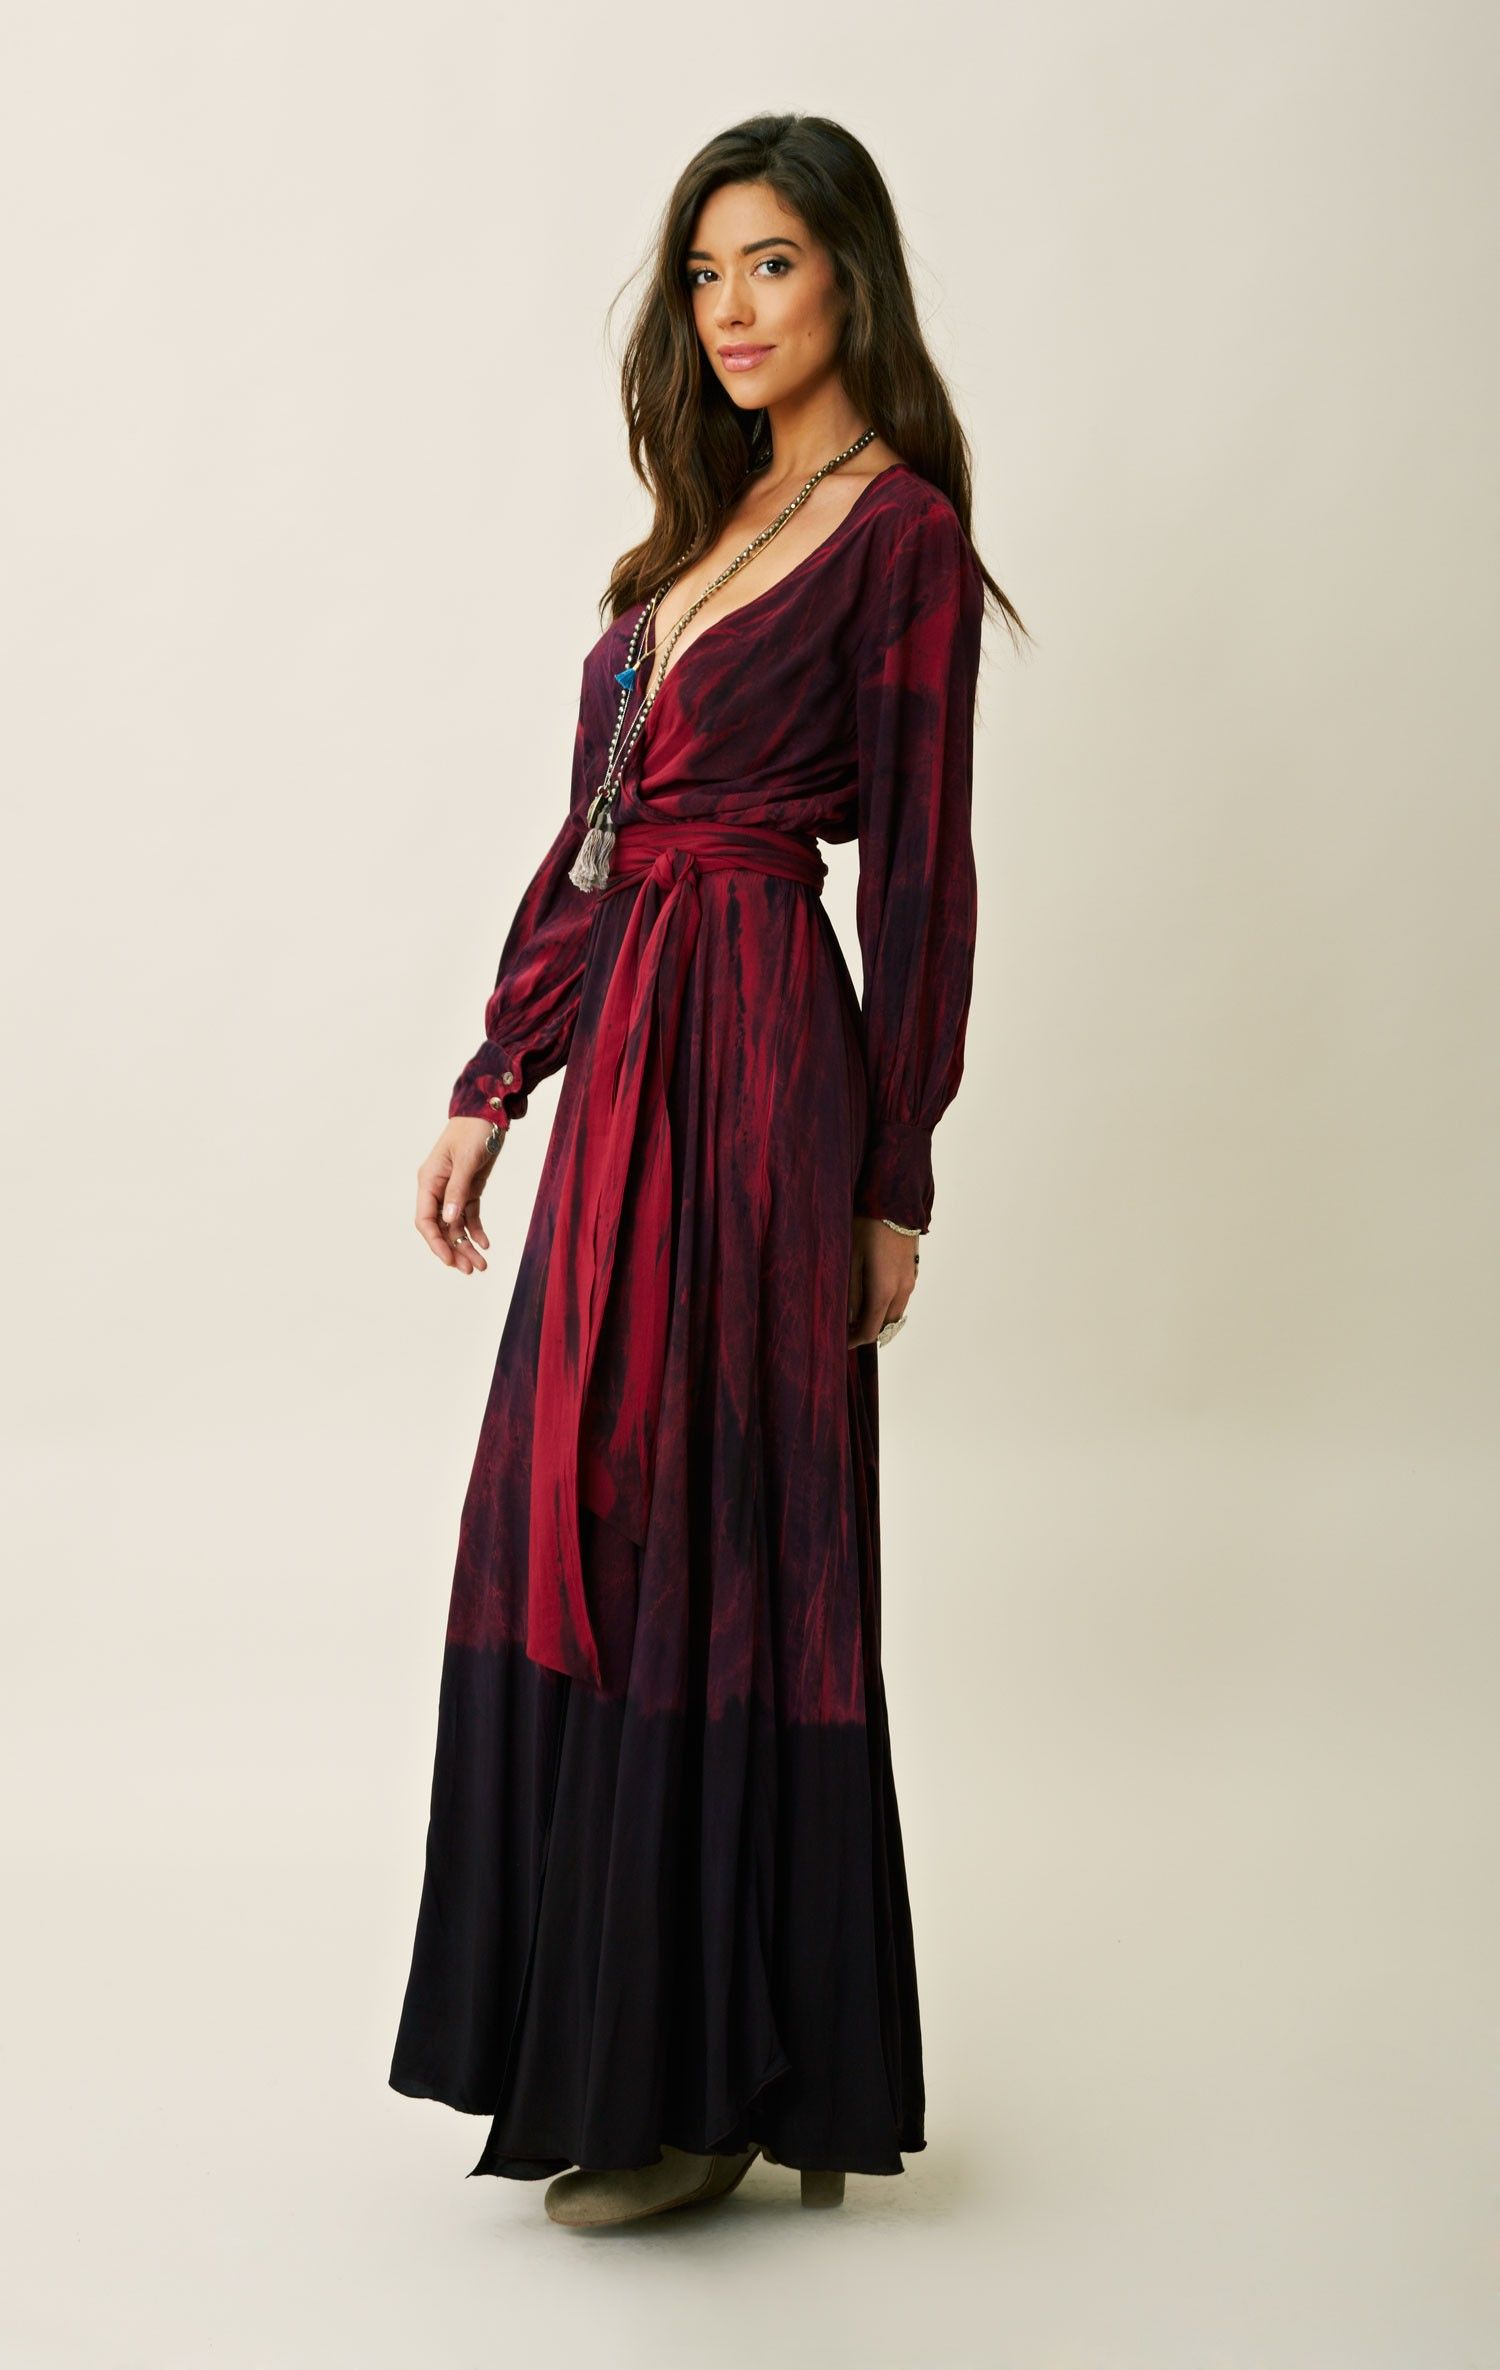 S style tie dye dress dress delusion pinterest s style